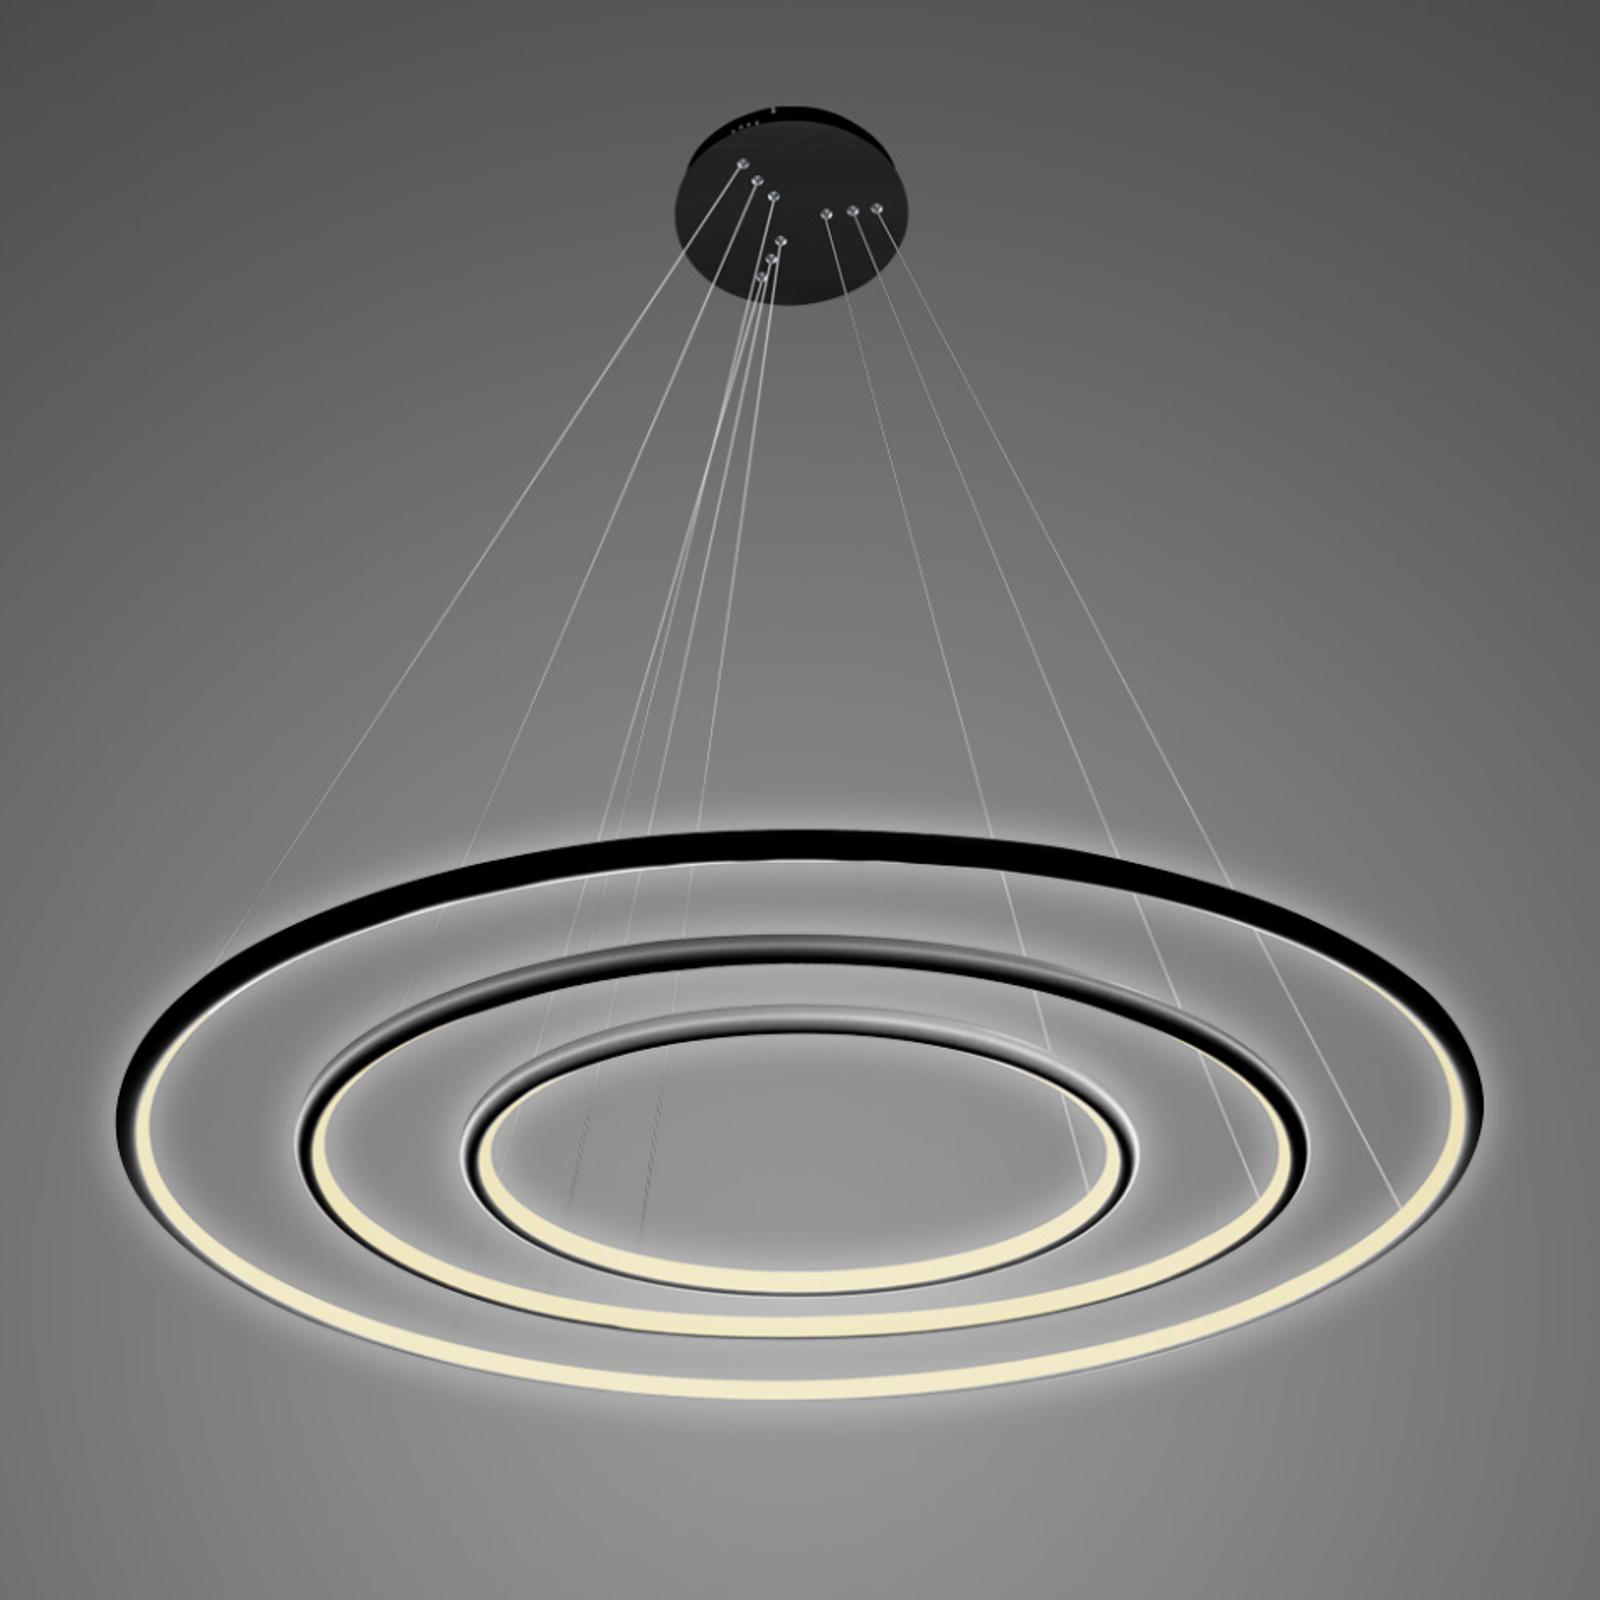 Lampa wisząca LA075 3-pkt. 80cm czarna 3000K